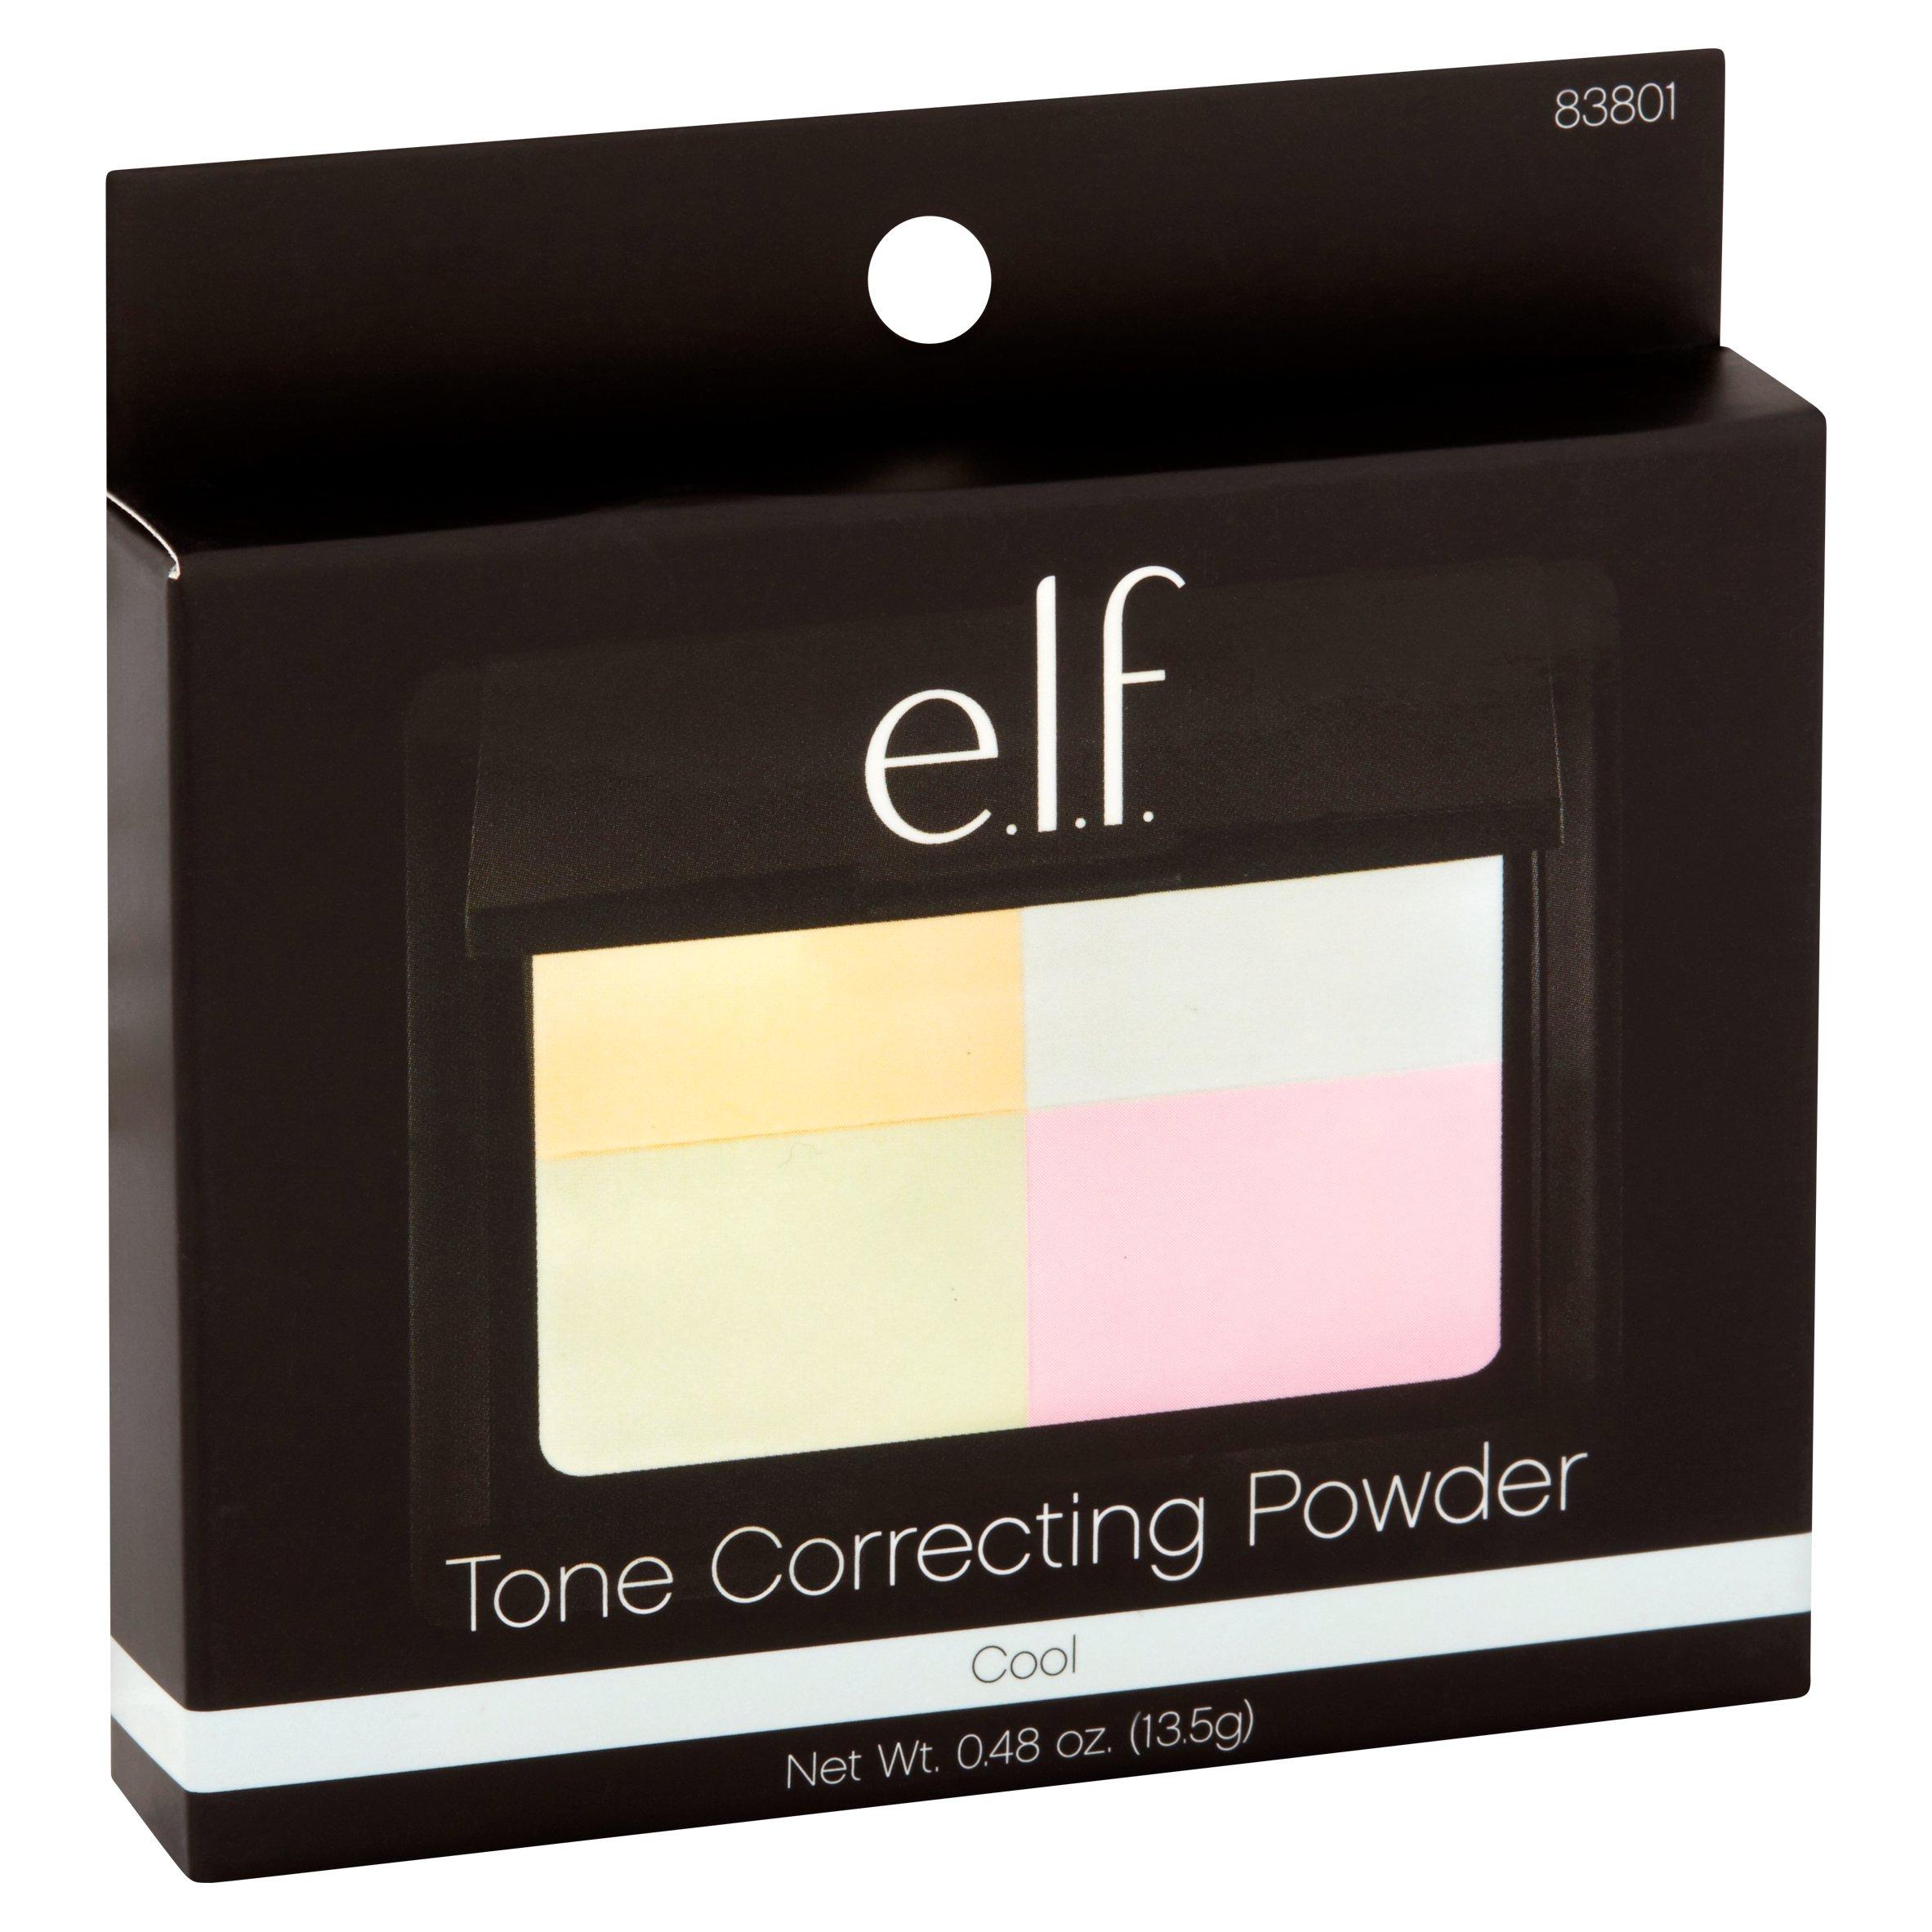 e.l.f. Cosmetics Tone Correcting Powder, Cool